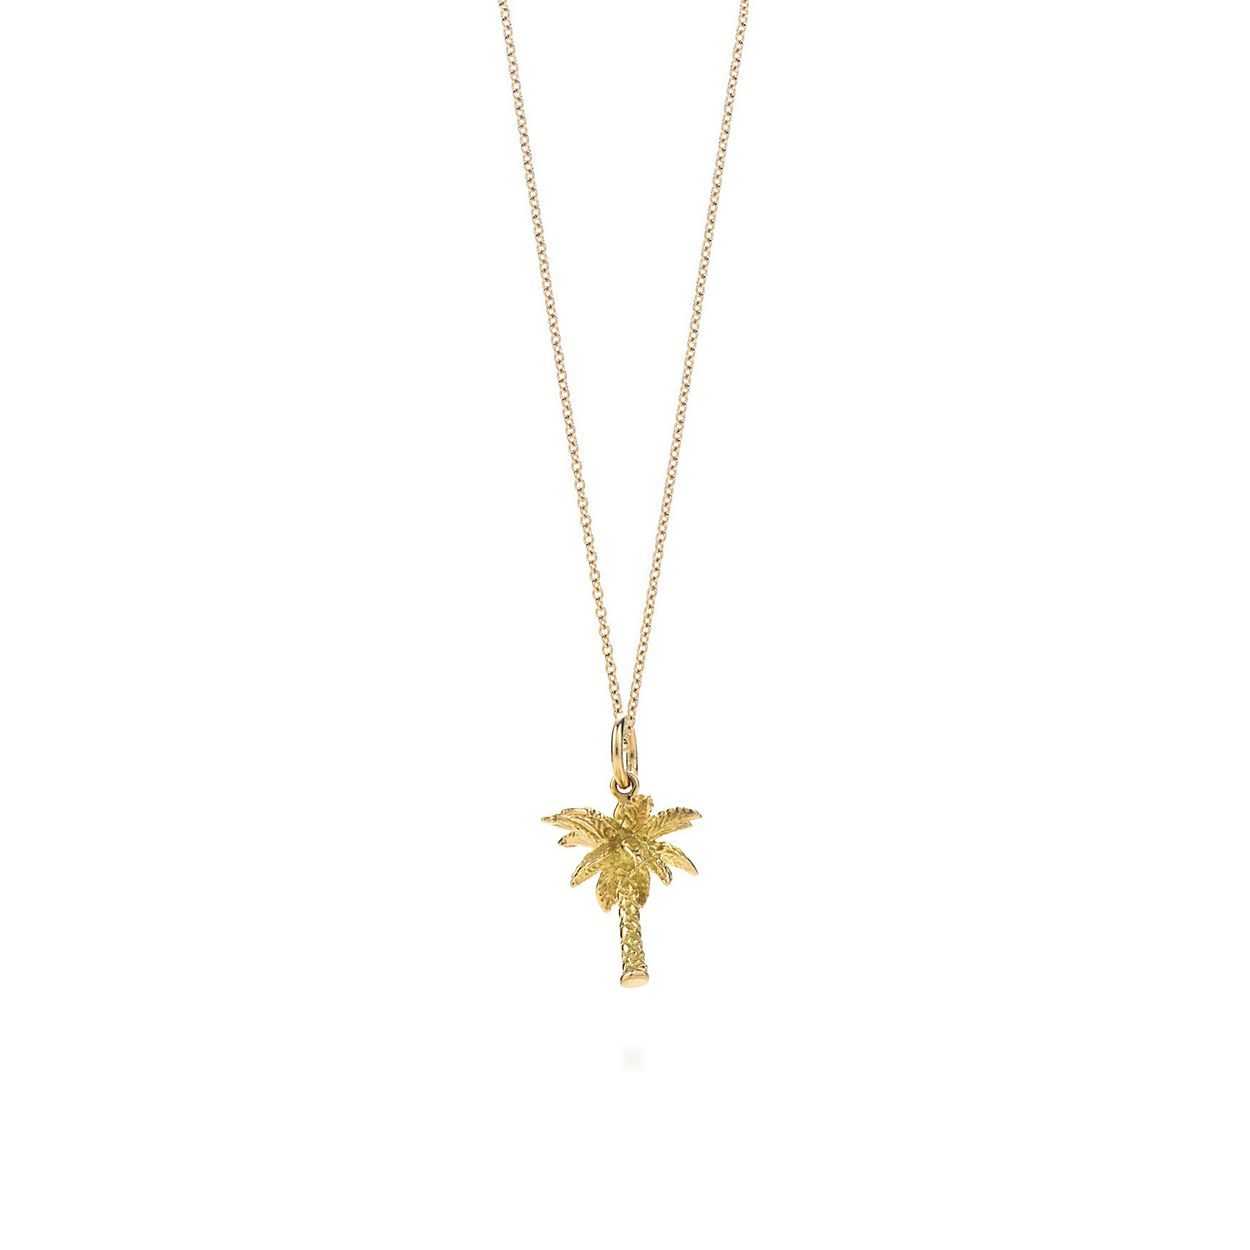 Palm tree charm 18k gold on a chain tiffany co palm tree charm pendant palm tree charm pendant mozeypictures Choice Image